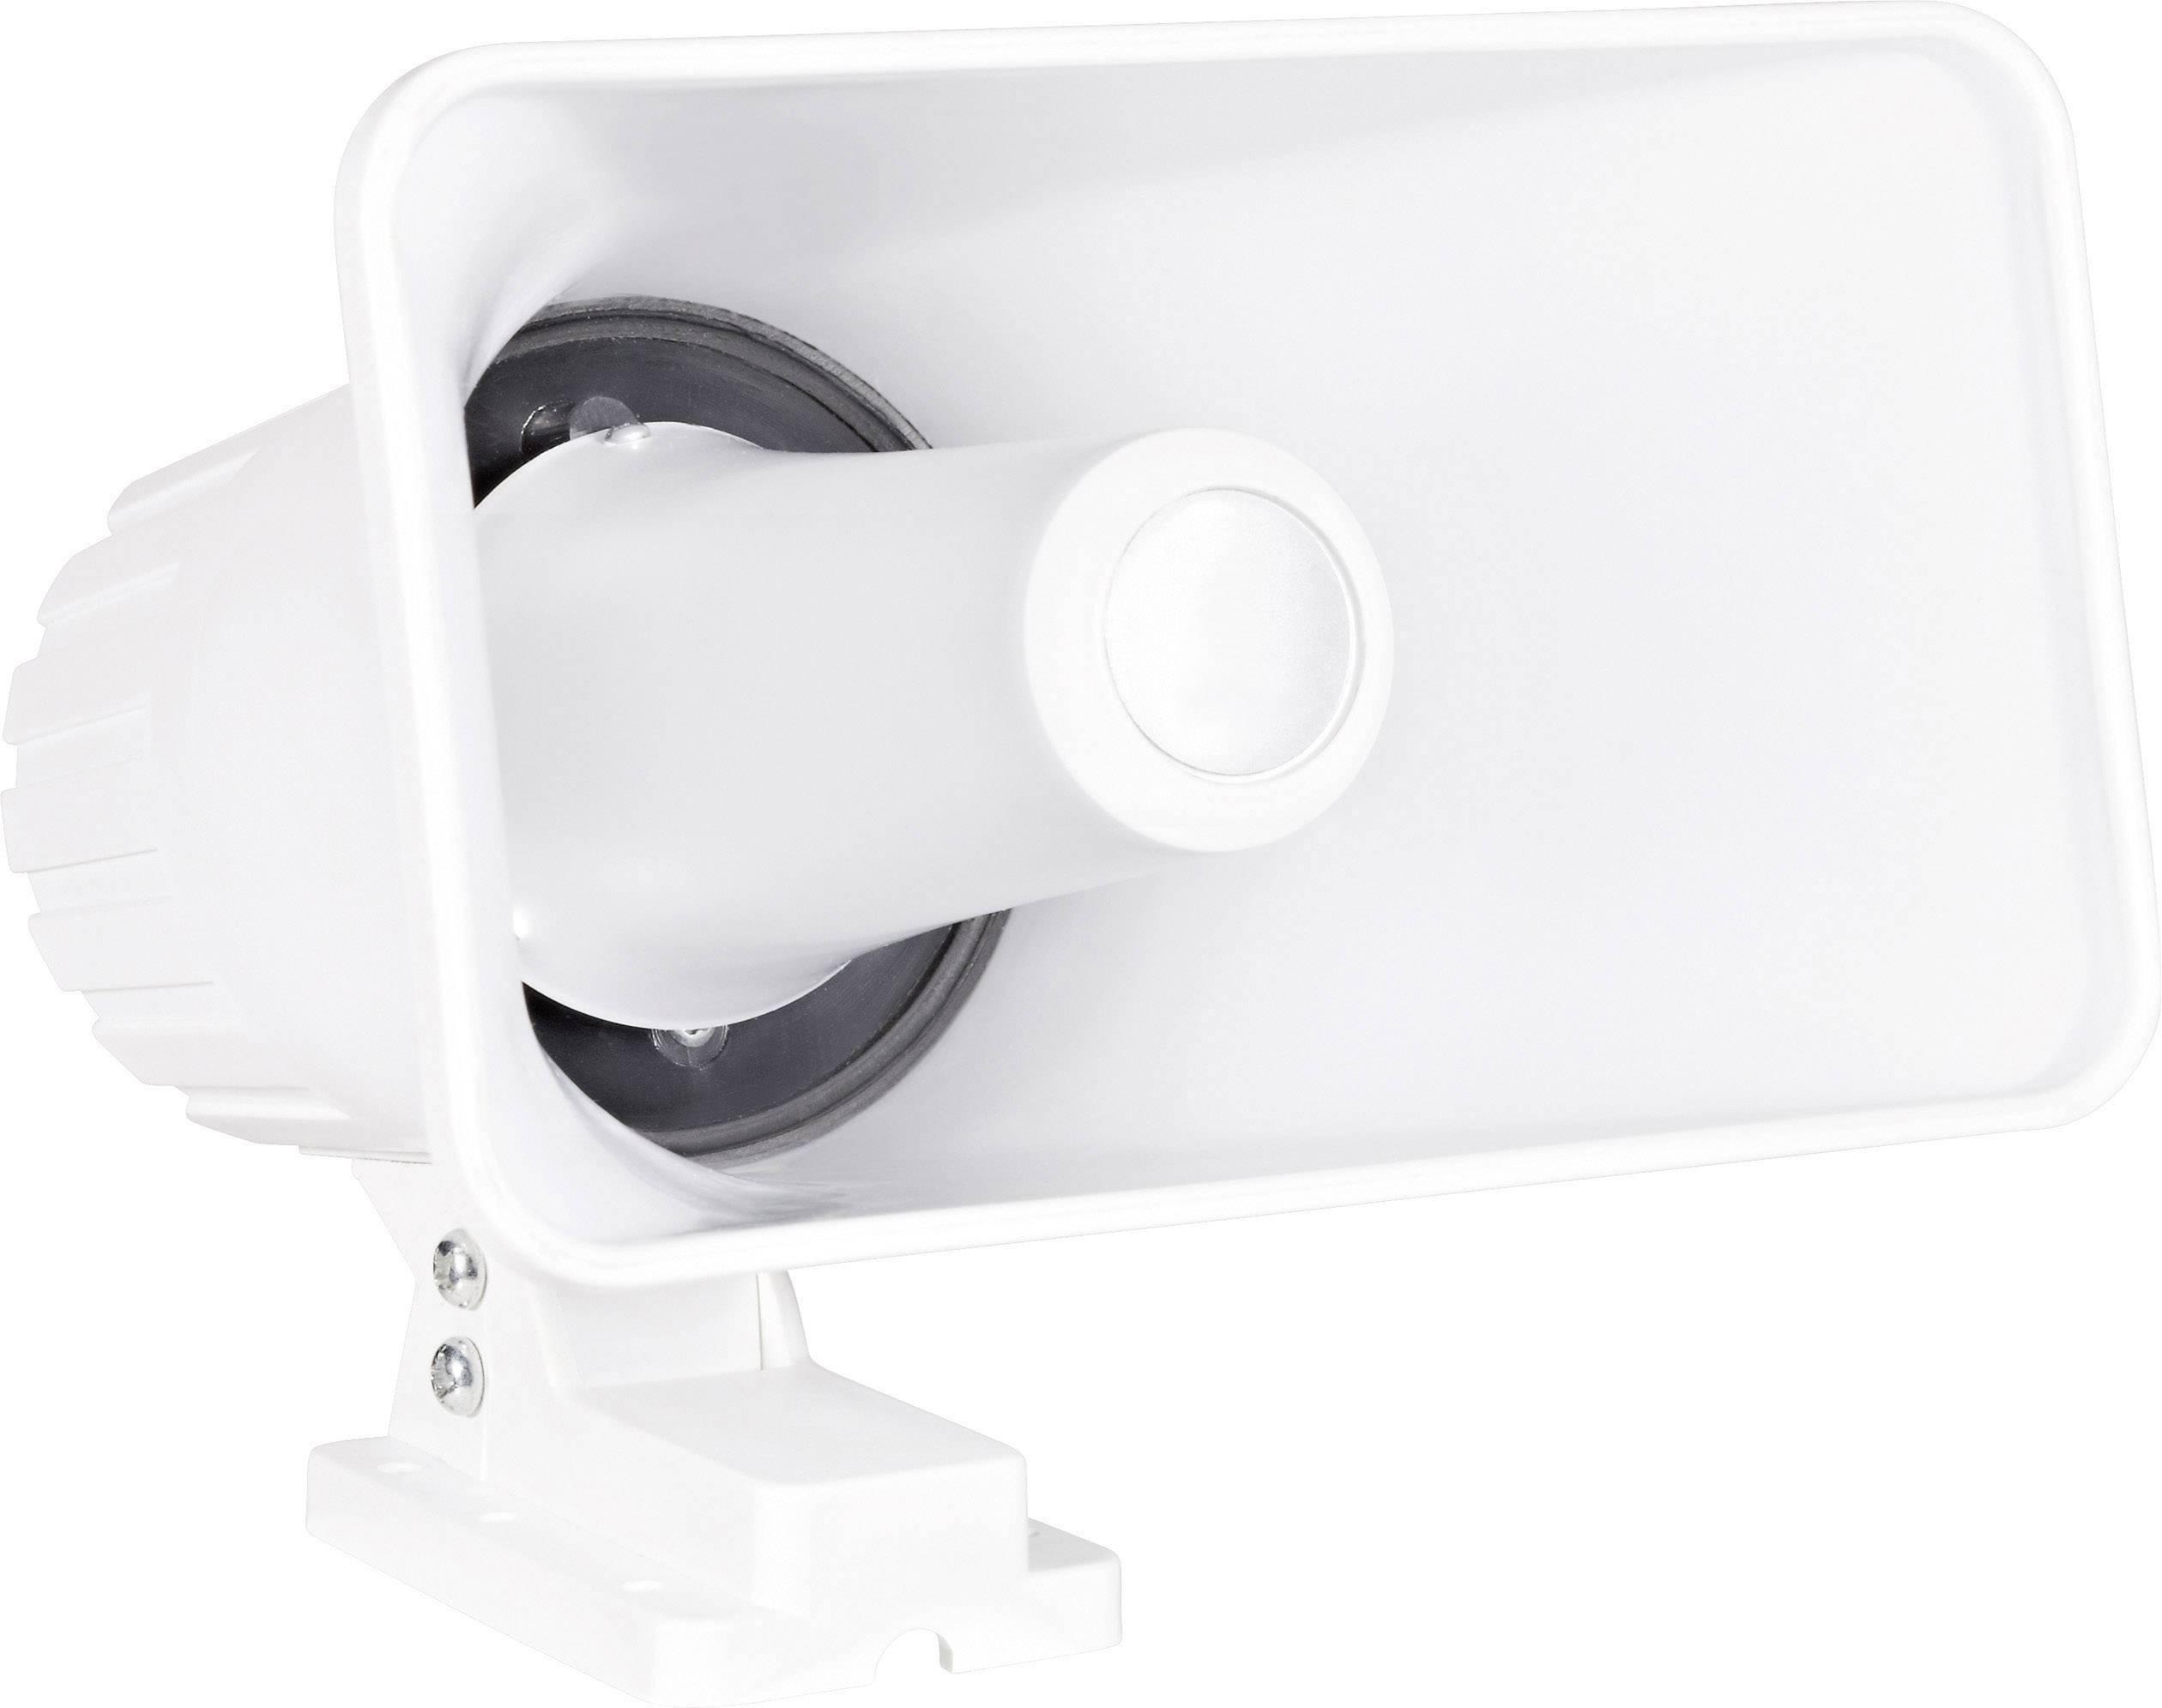 Tlakový reproduktor SpeaKa Professional LP-30, 50 W, biela, 1 ks